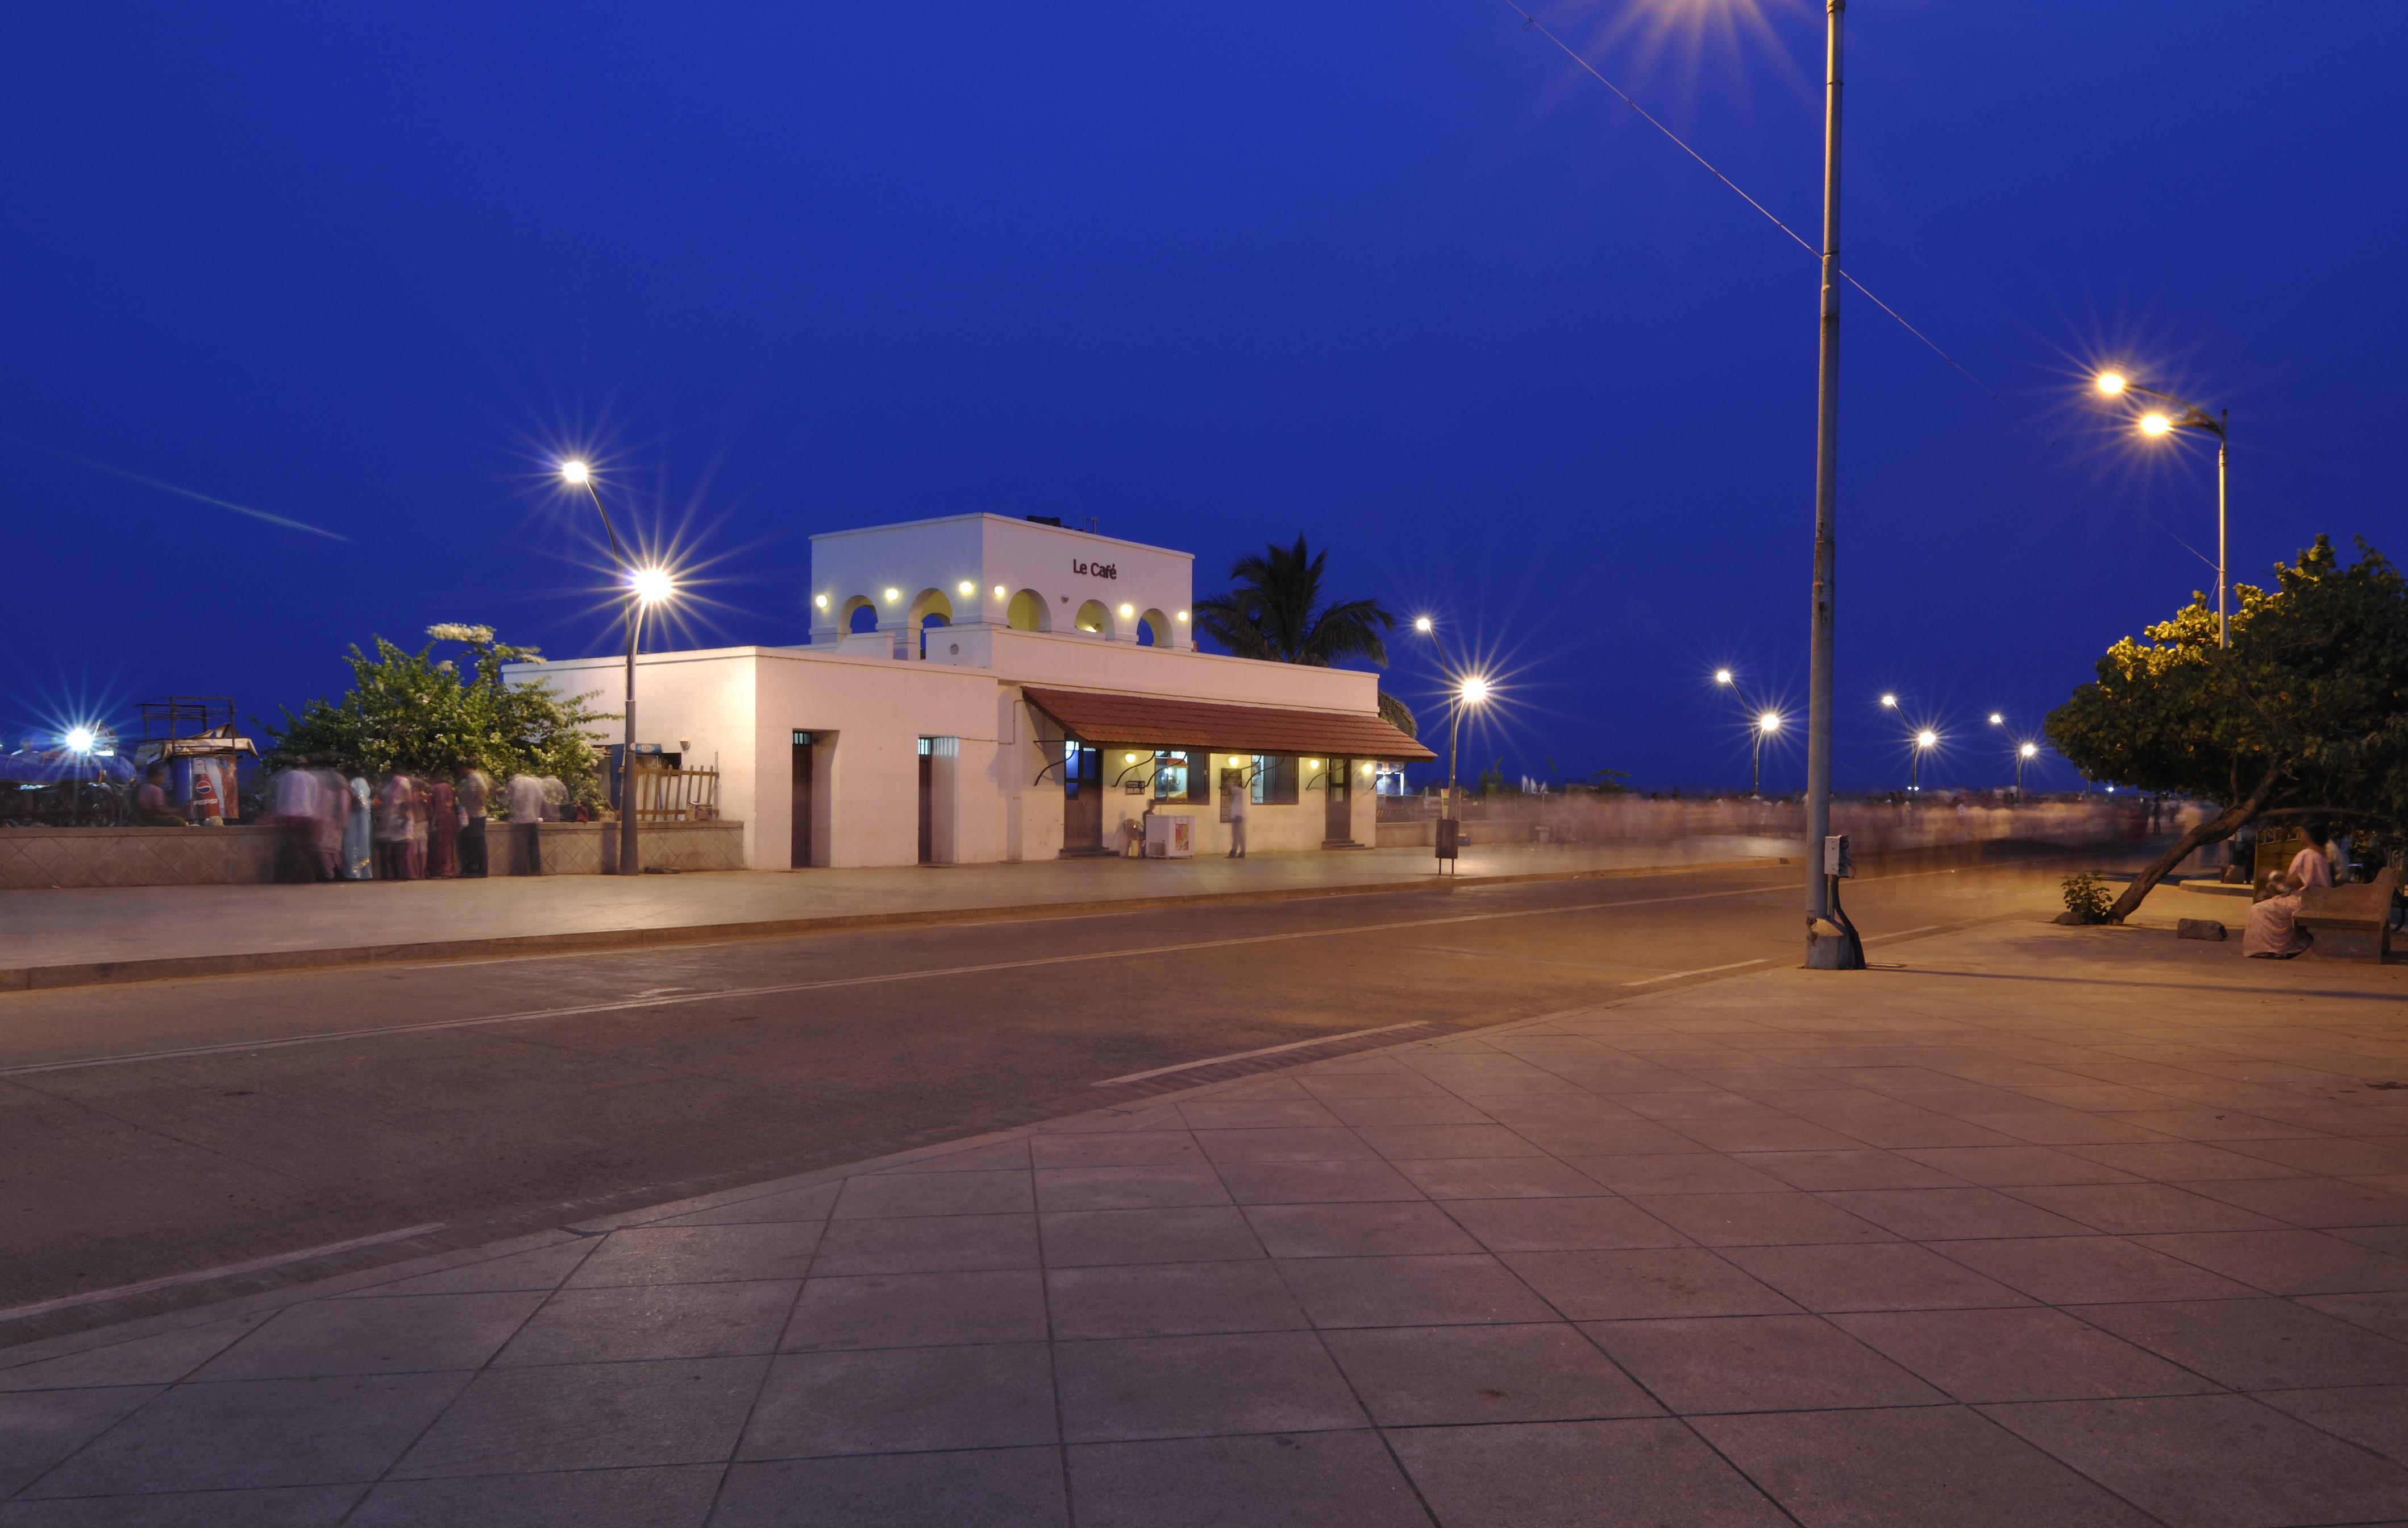 Pondicherry India  city images : Beach Promenade, Pondicherry, India Wikipedia, the free ...